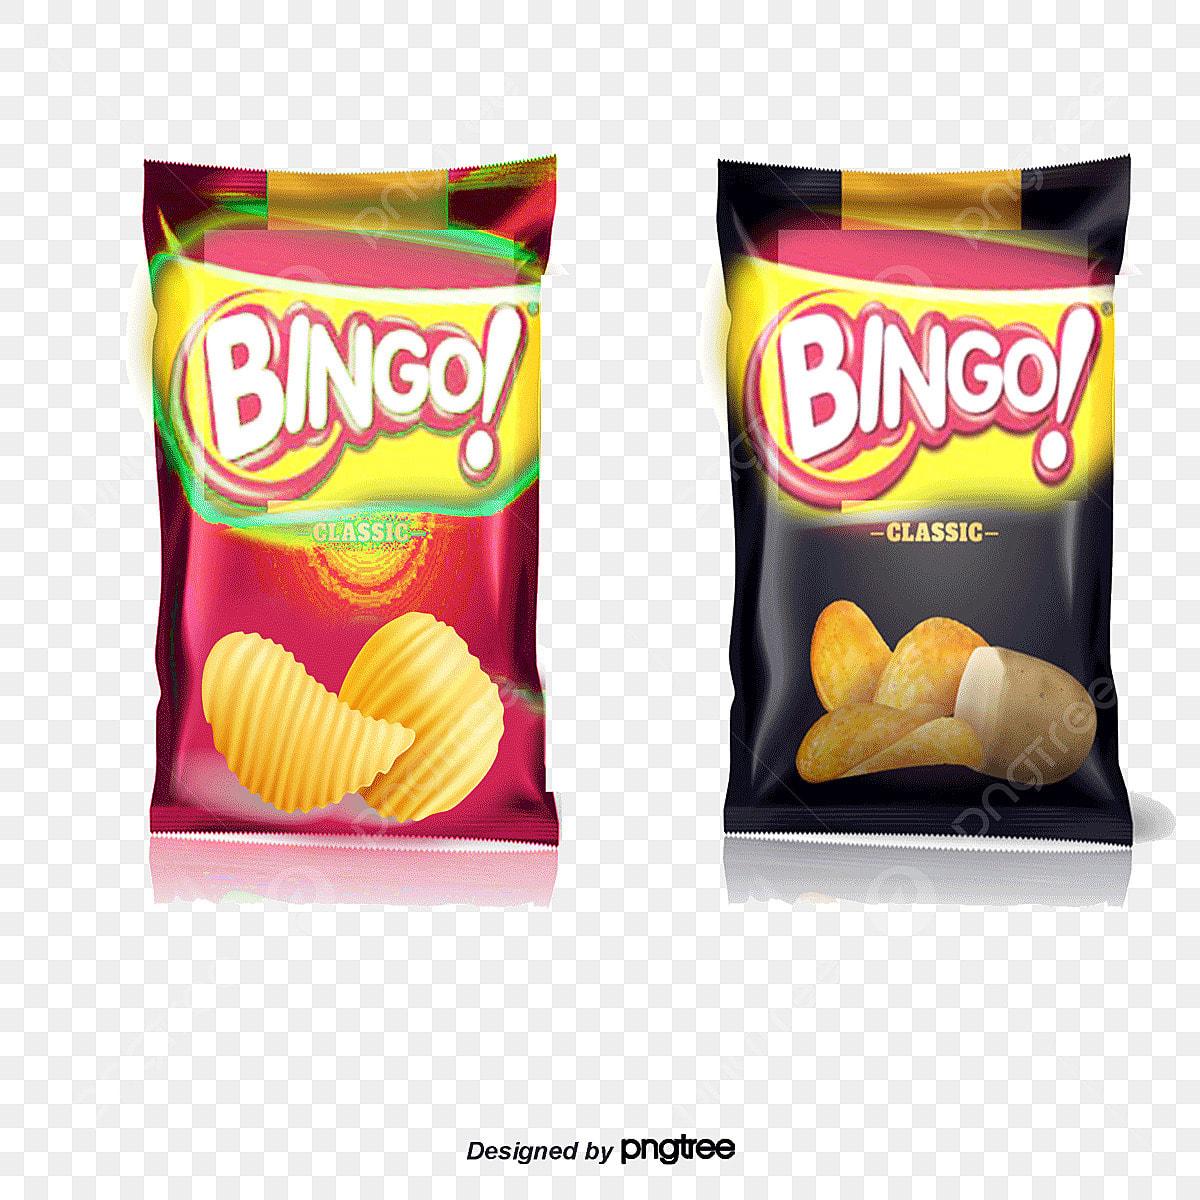 Pop Actual Product Packaging Design Color Vacuum Cartoon Png